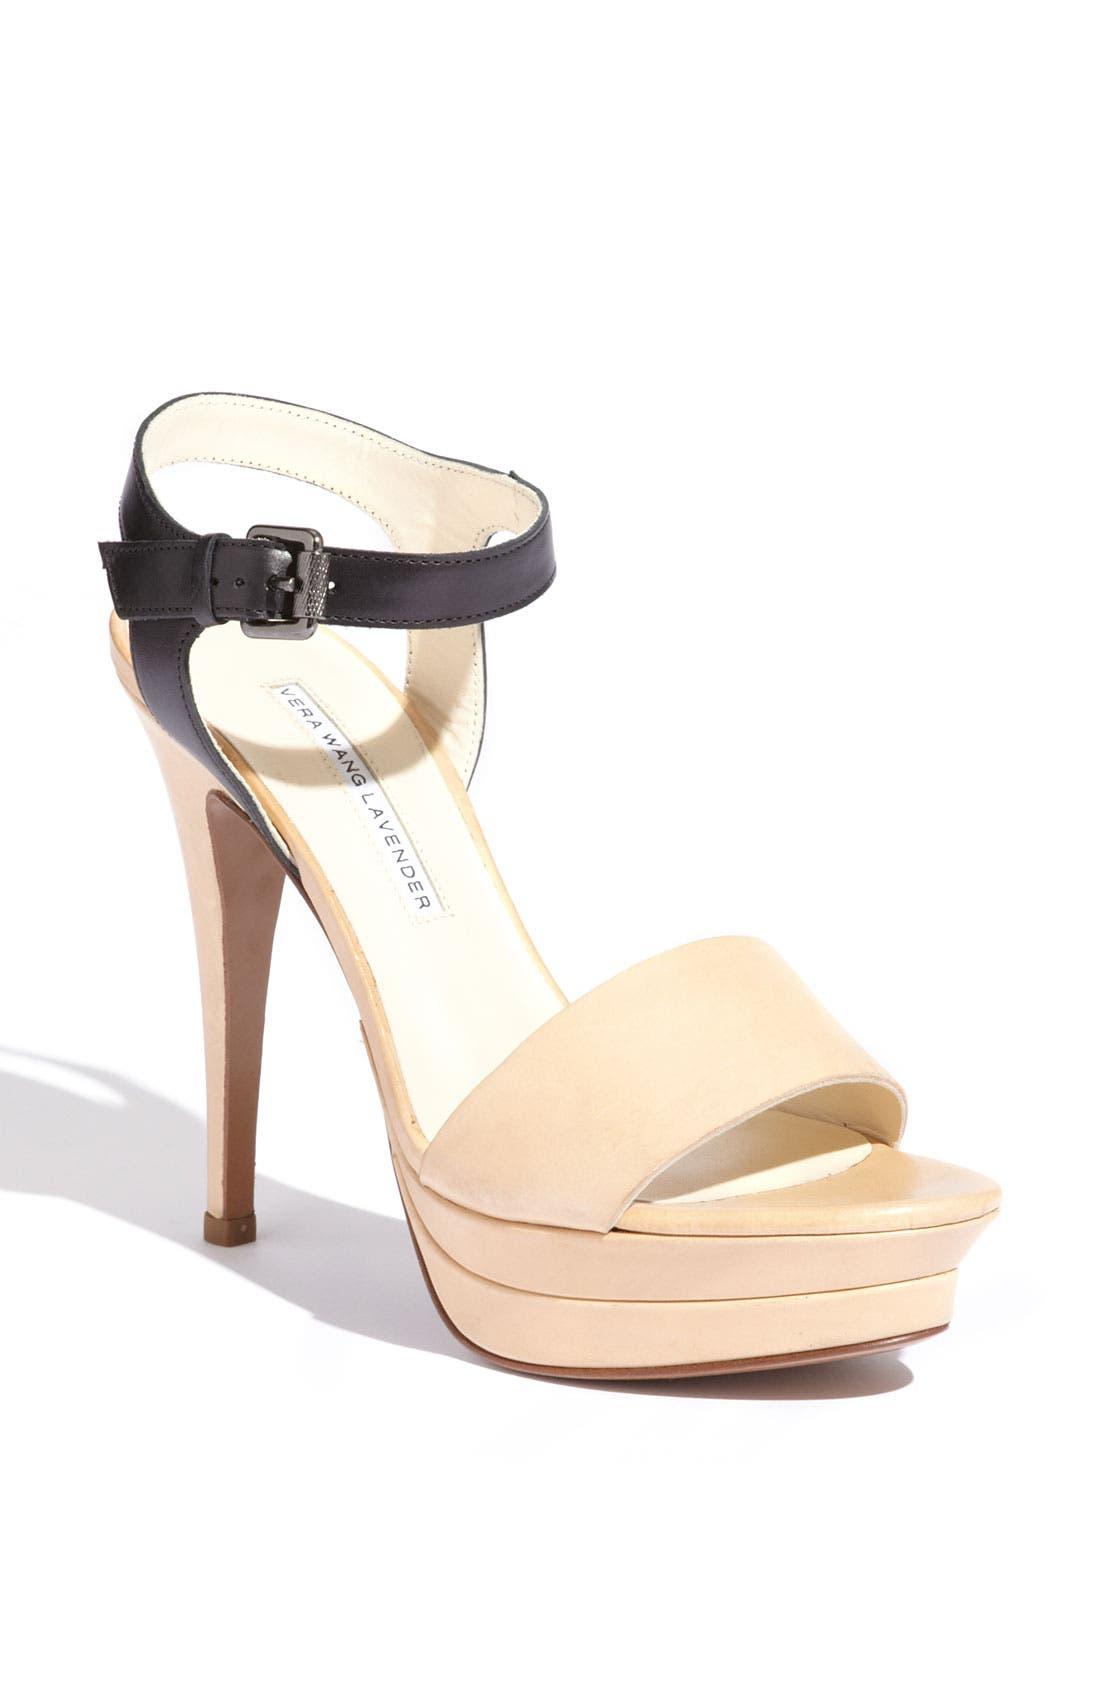 Alternate Image 1 Selected - Vera Wang 'Nina' Sandal